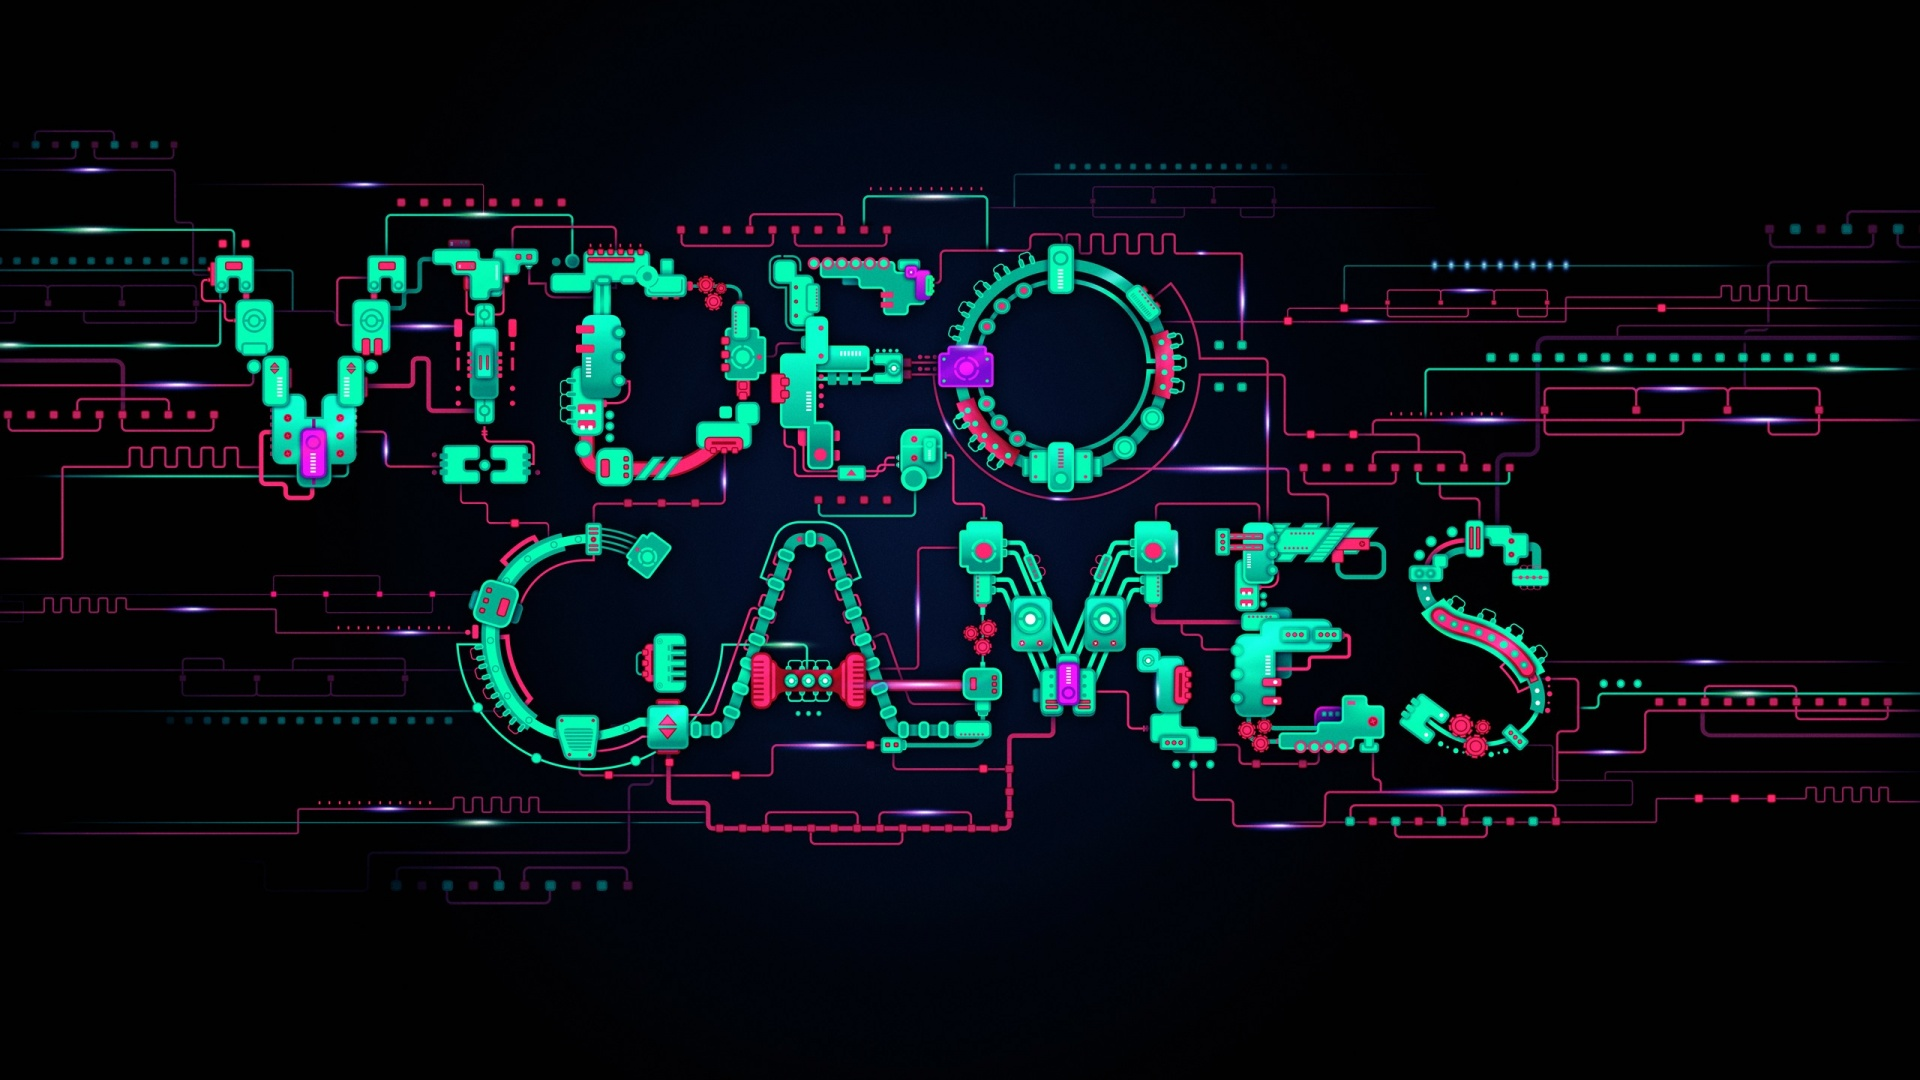 1920x1080 Video Games Typography desktop PC and Mac wallpaper 1920x1080